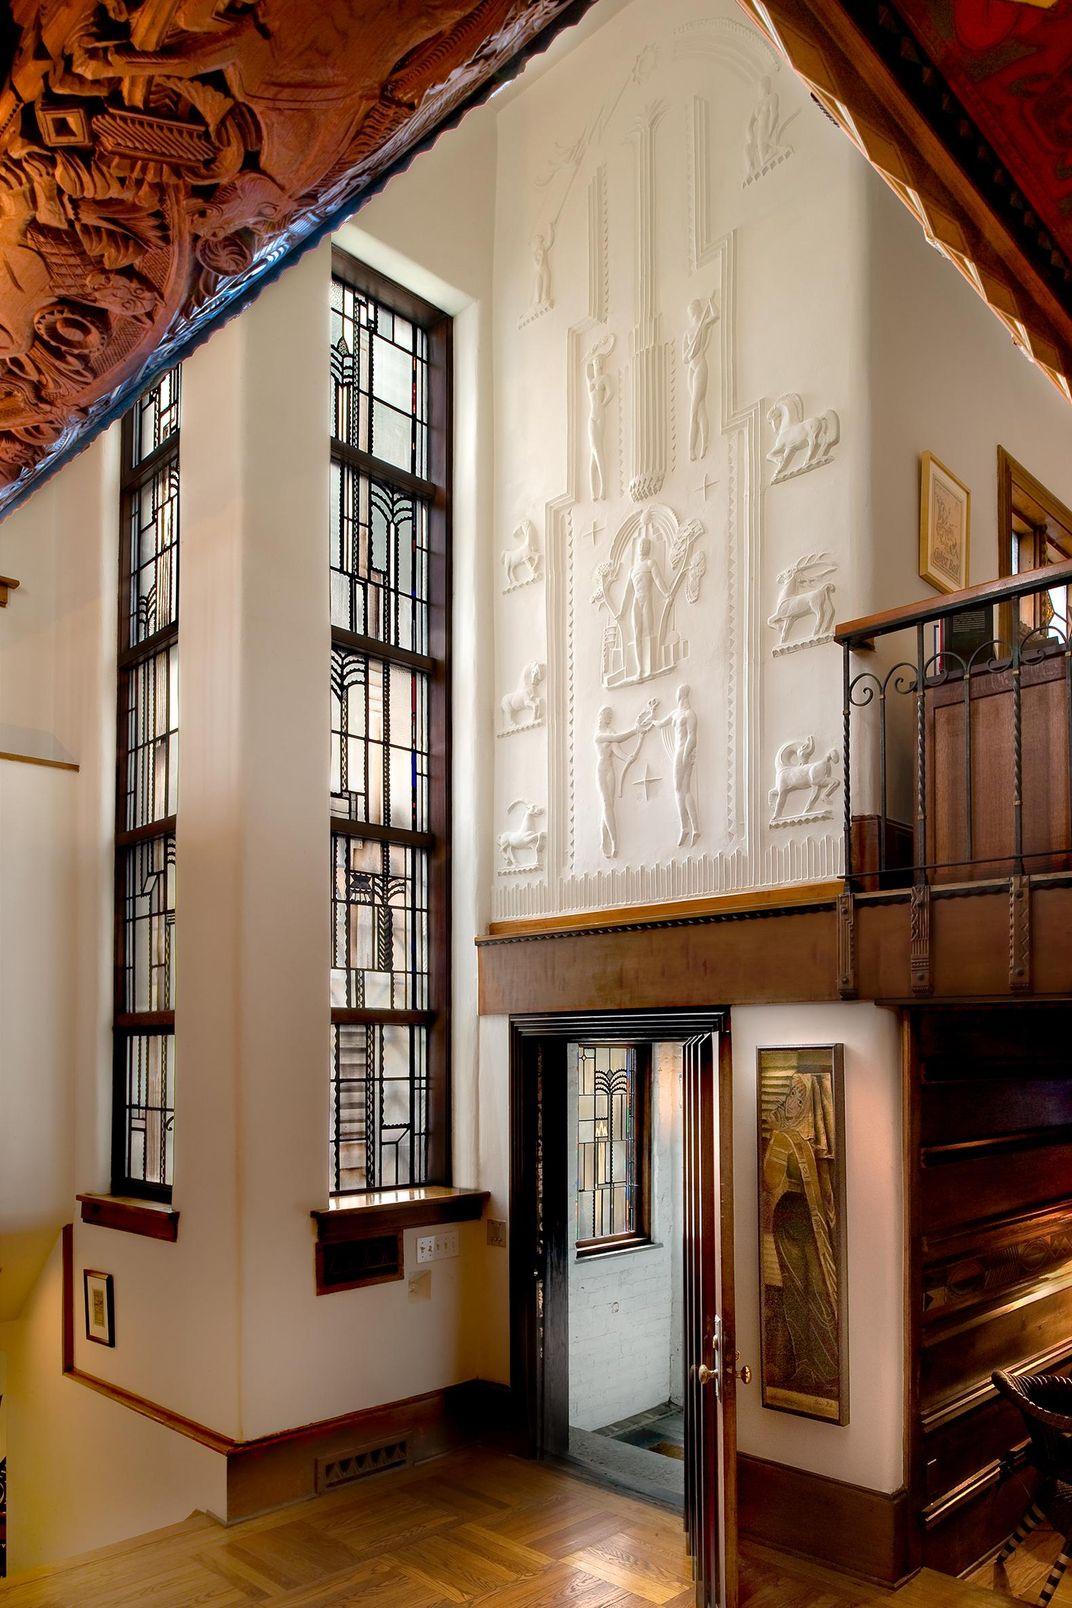 A New Virtual Tour Takes Us Inside Architect Edgar Miller's Masterwork